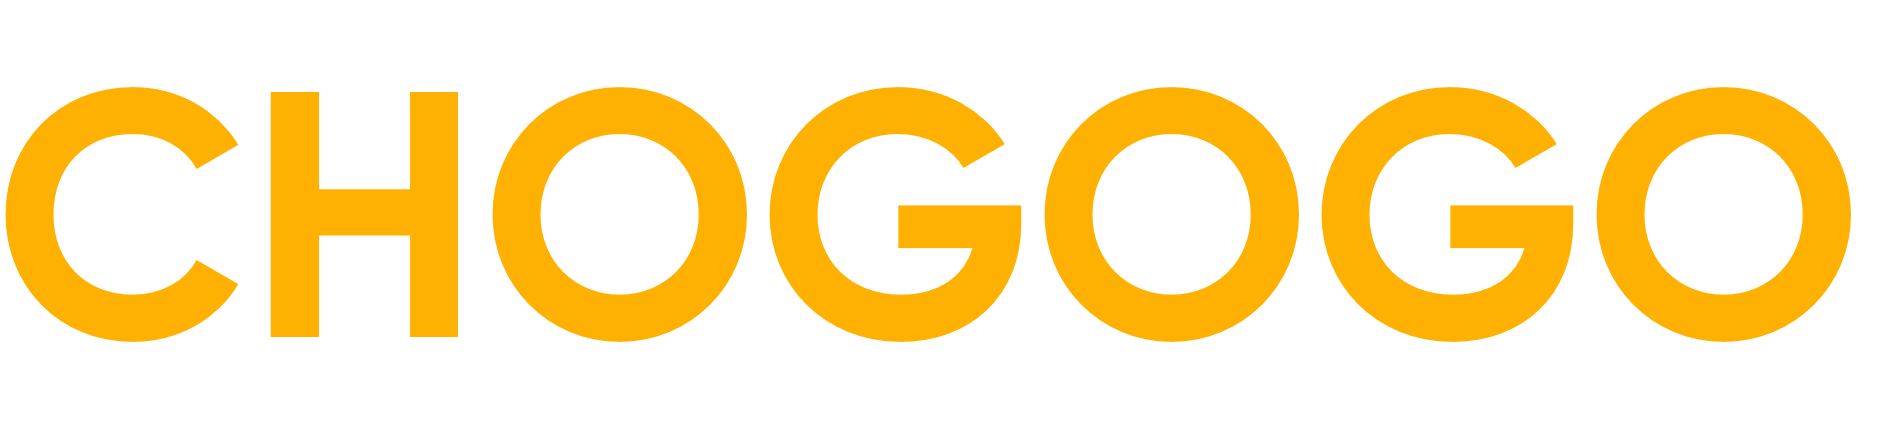 CHOGOGO LOGO YELLOW LEFT.png